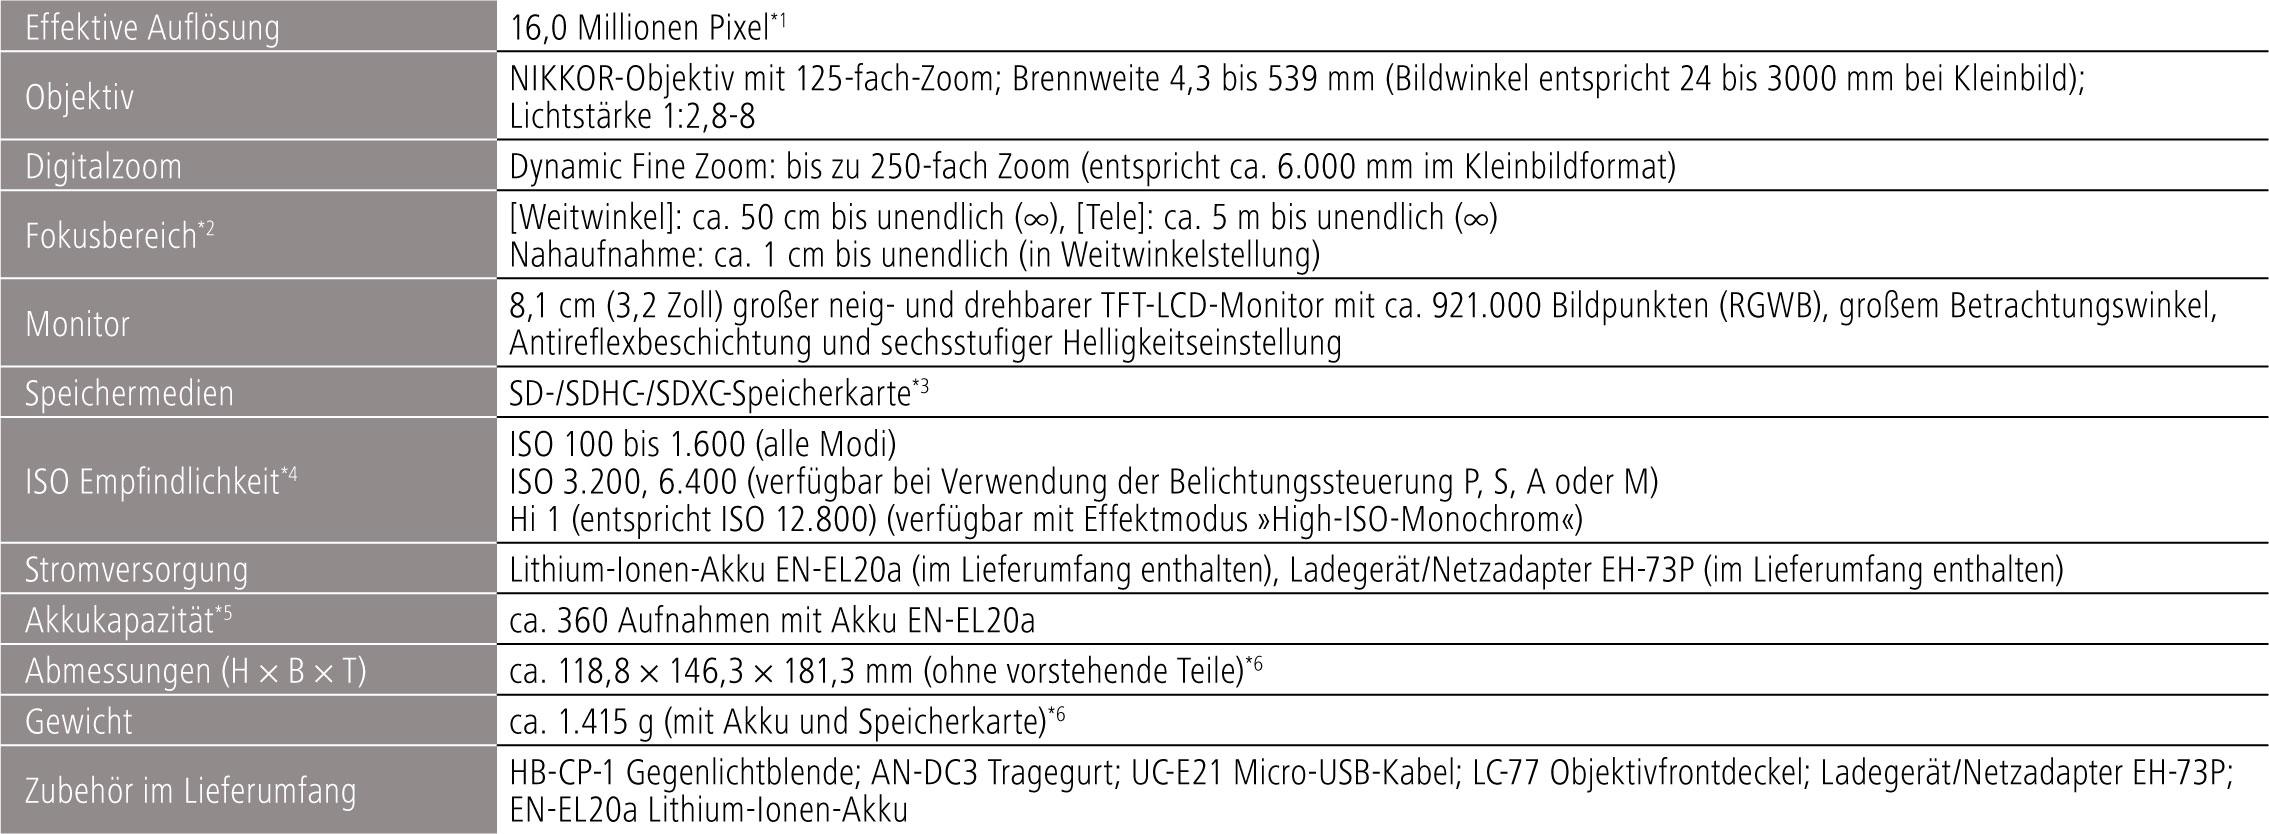 Nikon P1000 Datenblatt